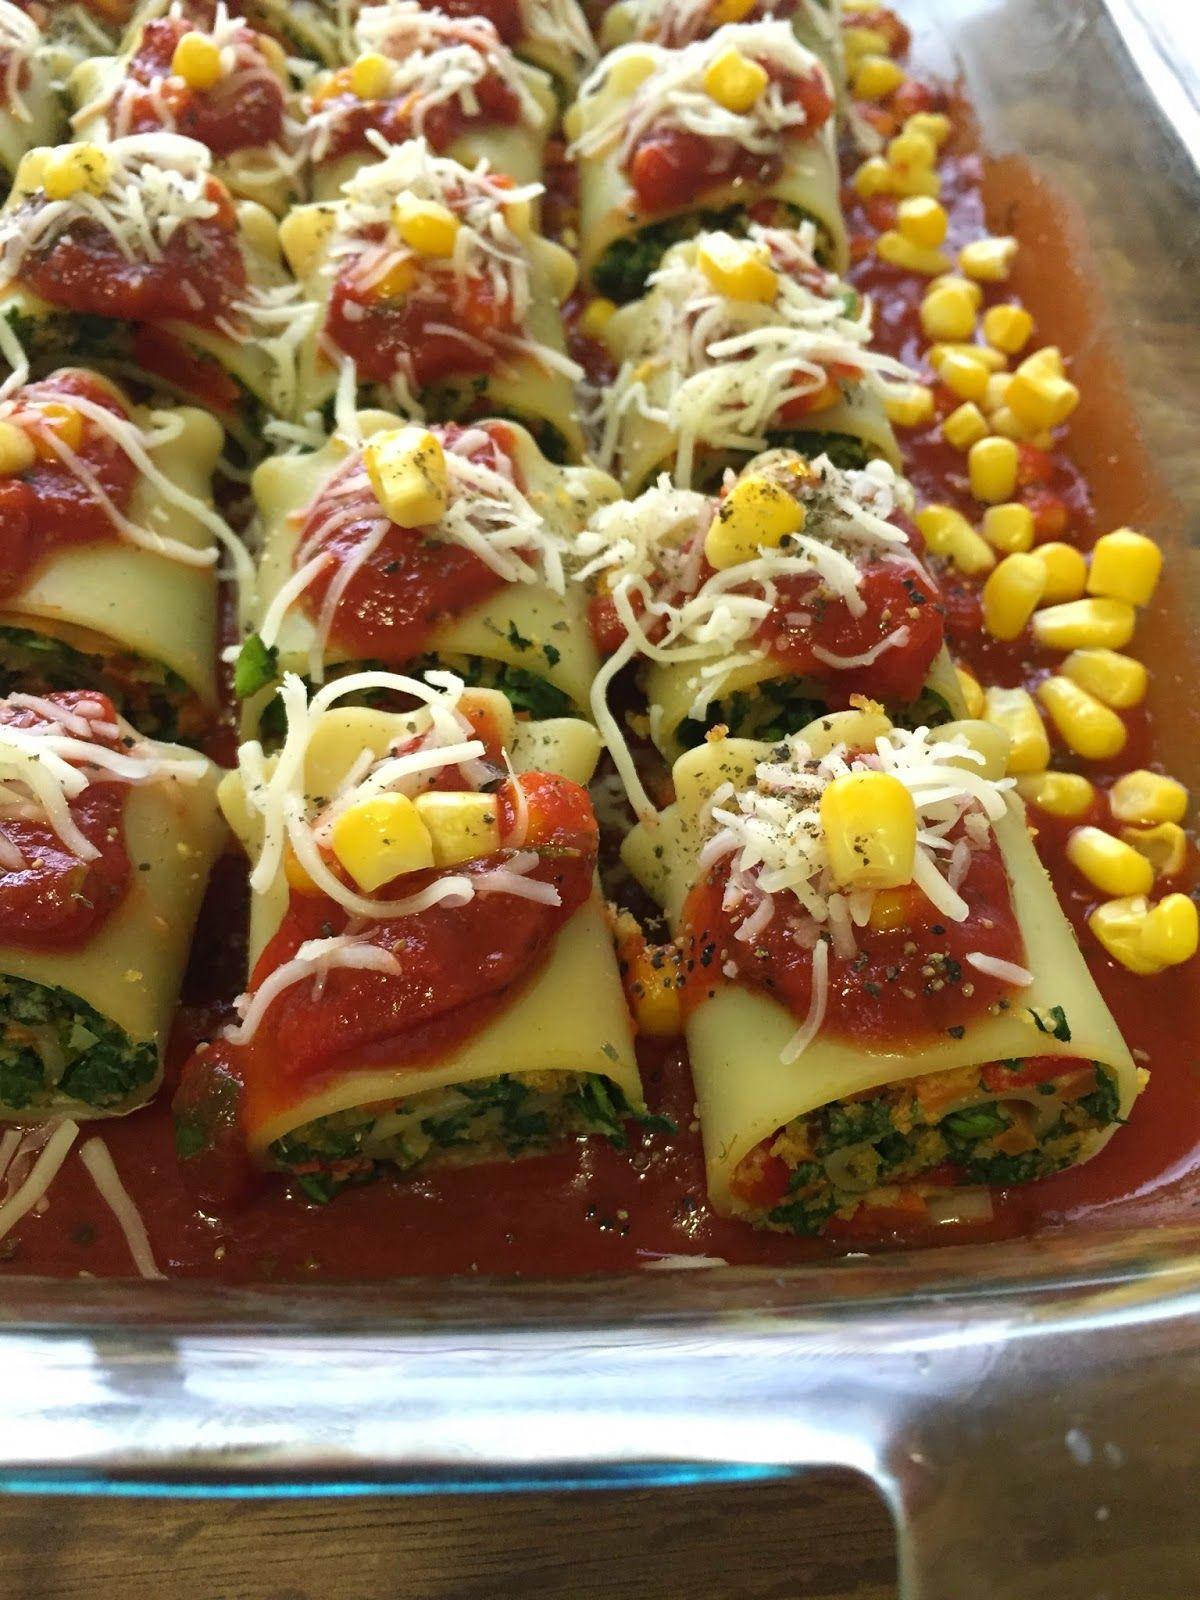 Italian Food Jain Style Isn 39 T It An Amazing Combination Ever If You Are Not Eating 39 Onion Veg Lasagna Recipe Indian Food Recipes Vegetarian Veg Snacks